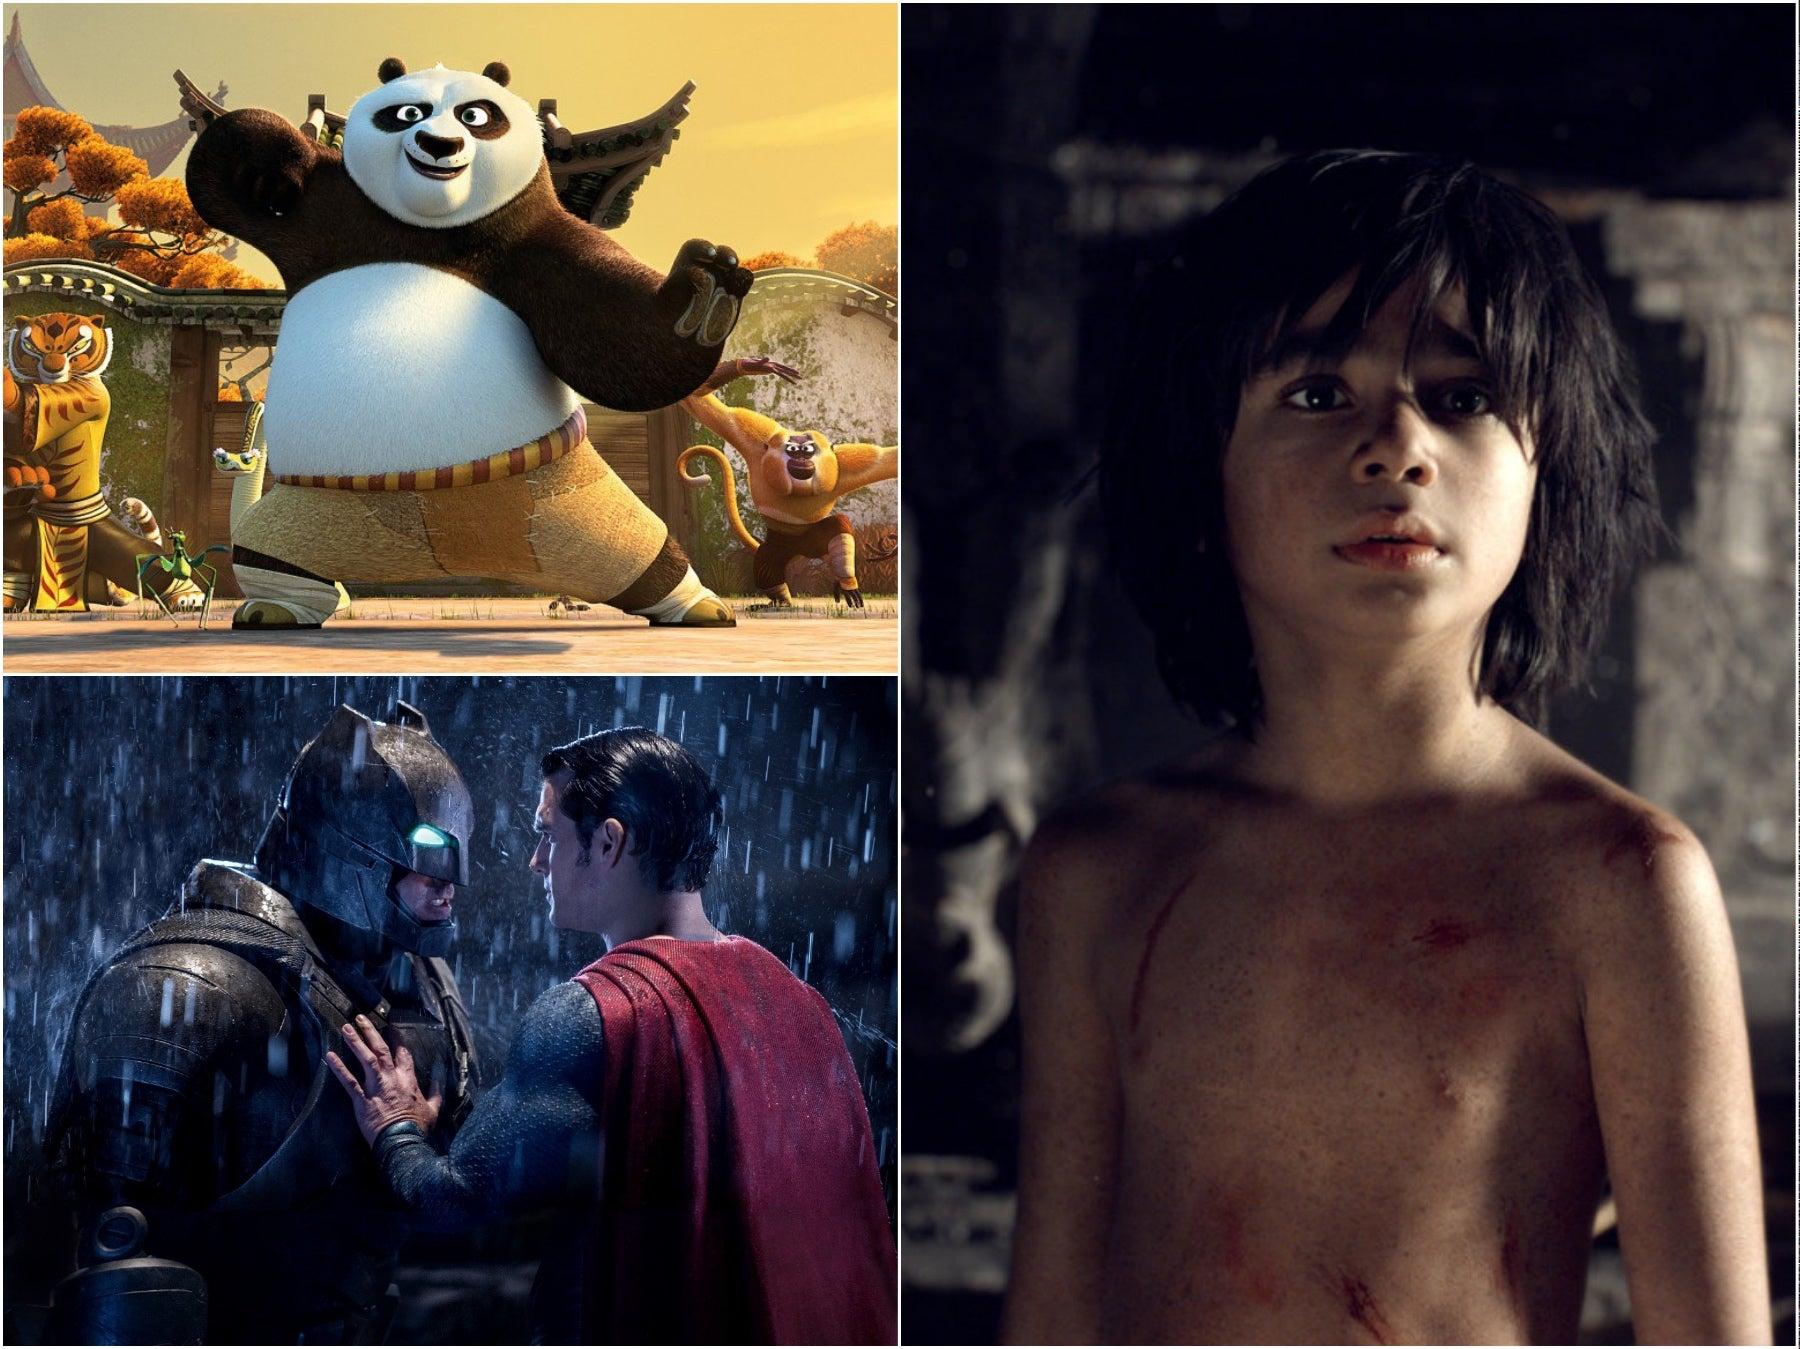 Scenes from Kung Fu Panda 3, Batman Vs Superman; and The Jungle Book